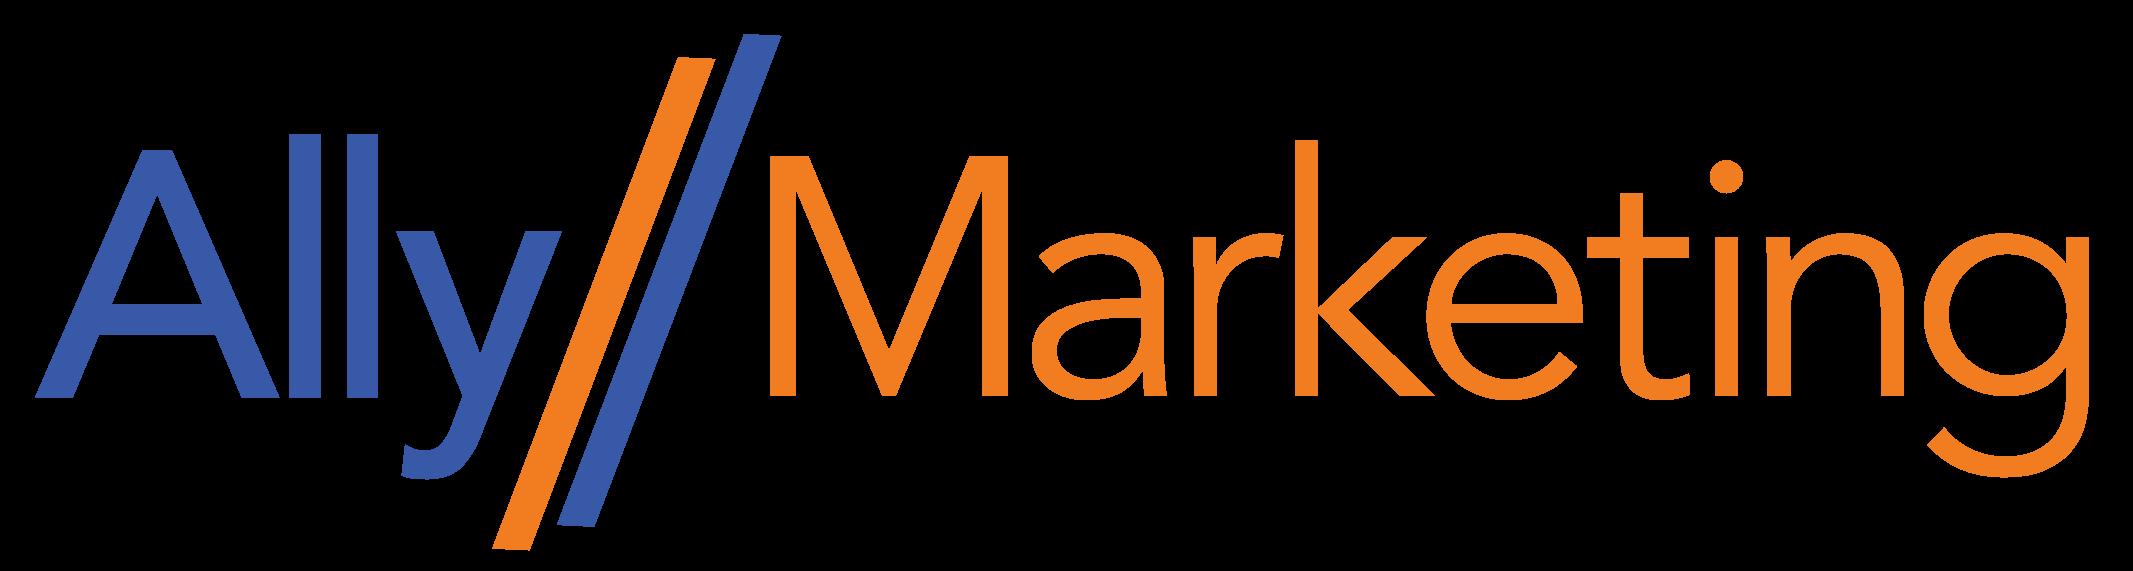 A digital marketing consultancy